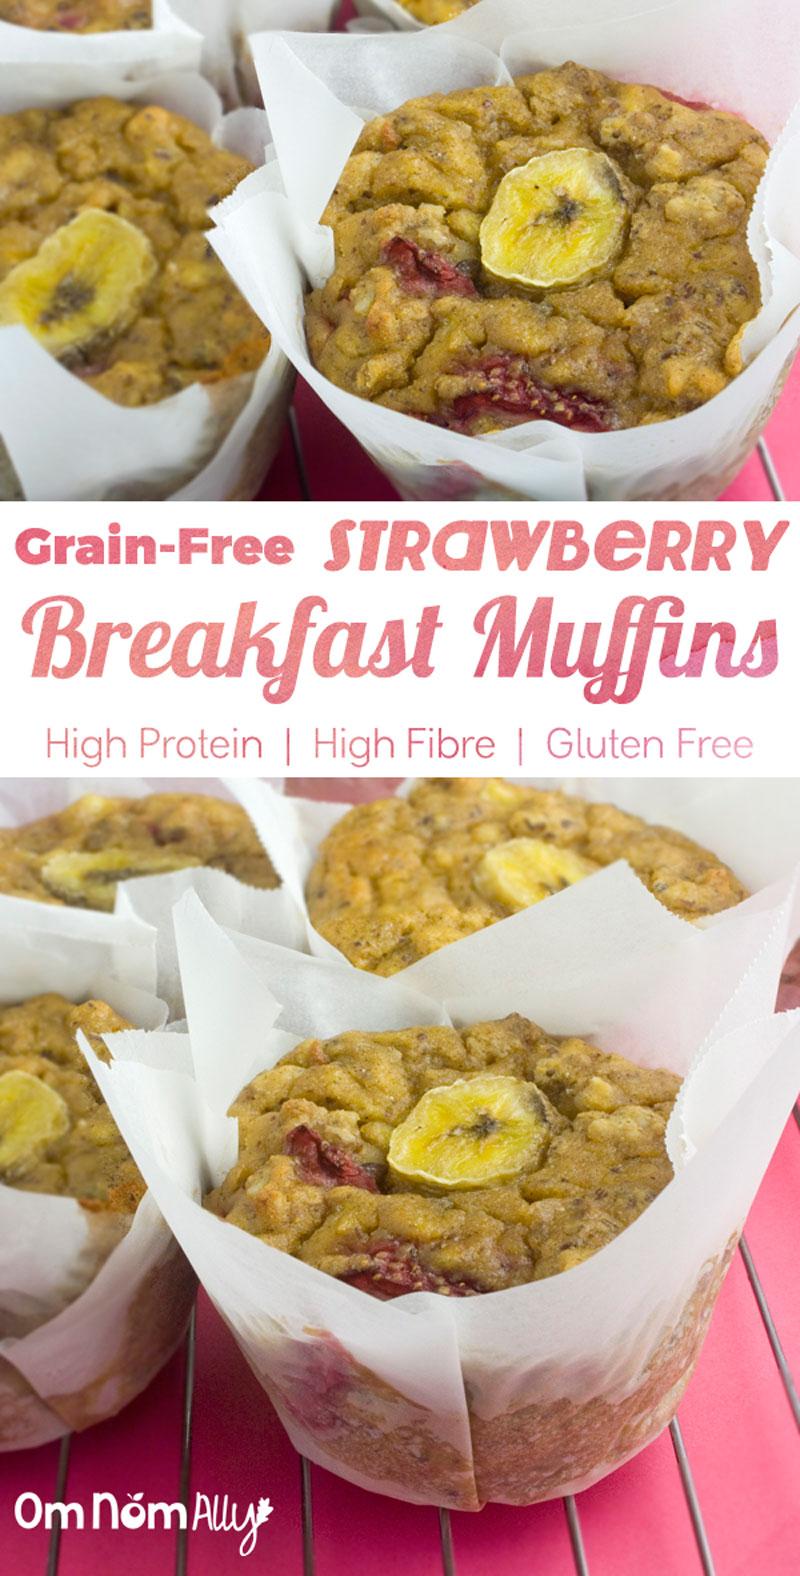 Grain-free Strawberry Breakfast Muffins